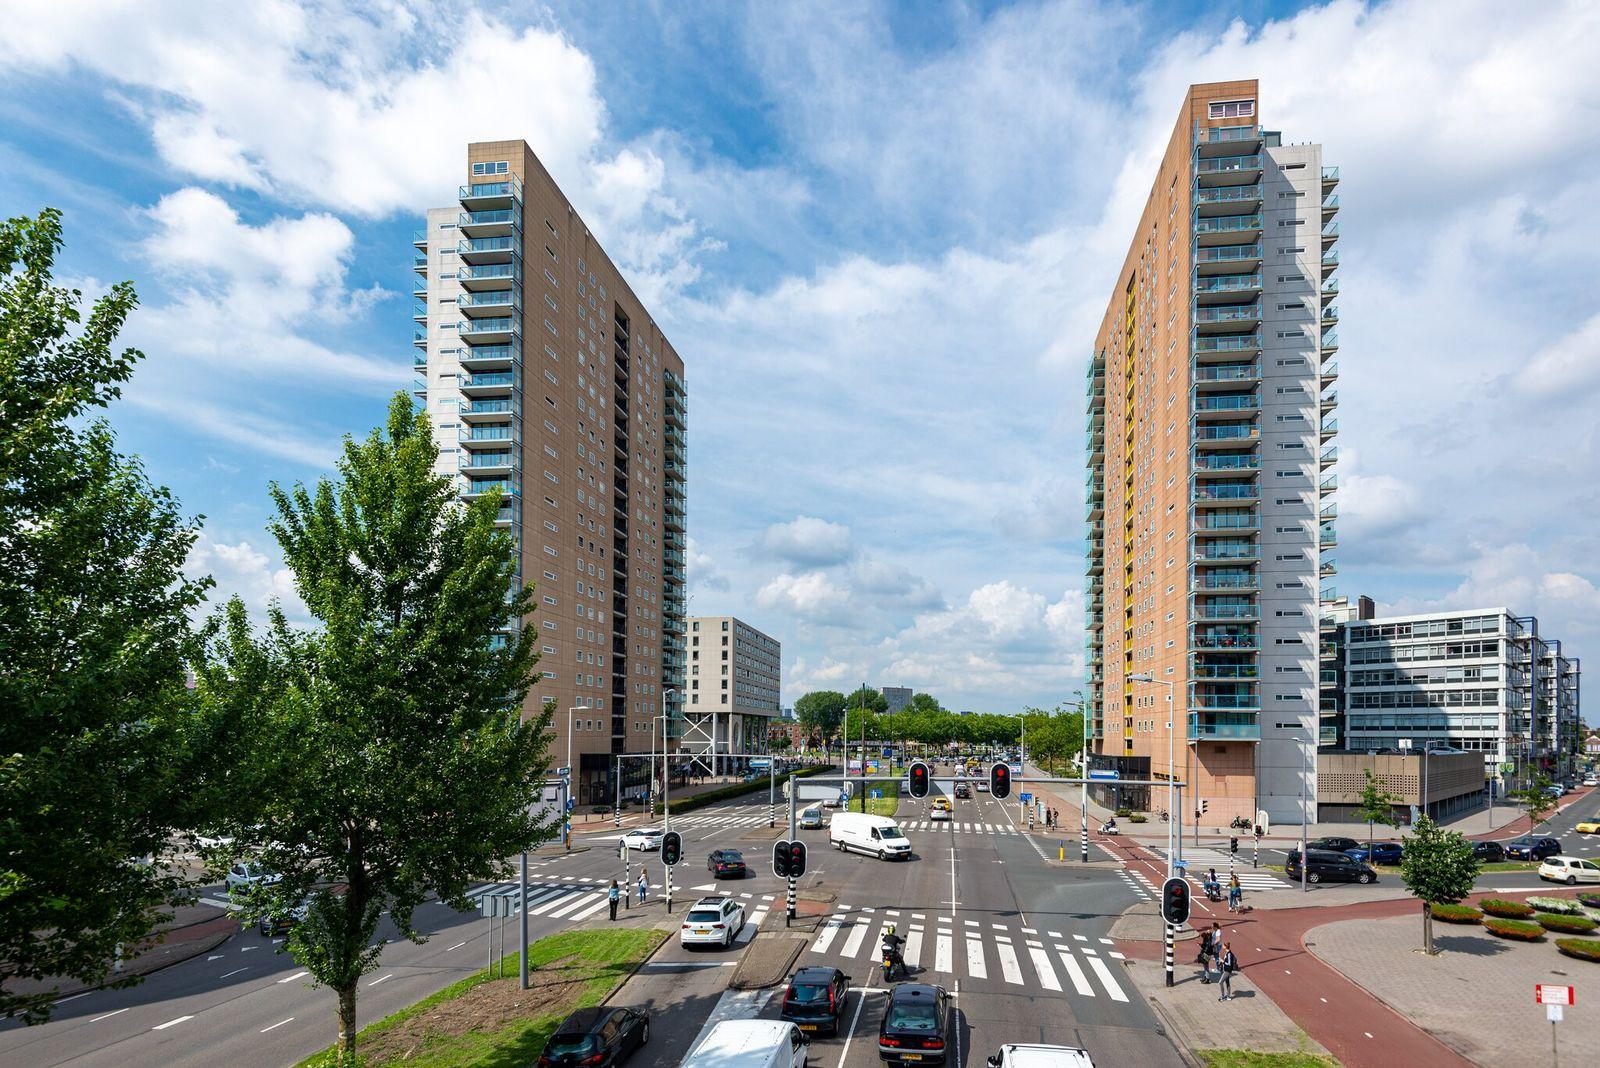 Strevelsweg 731, Rotterdam